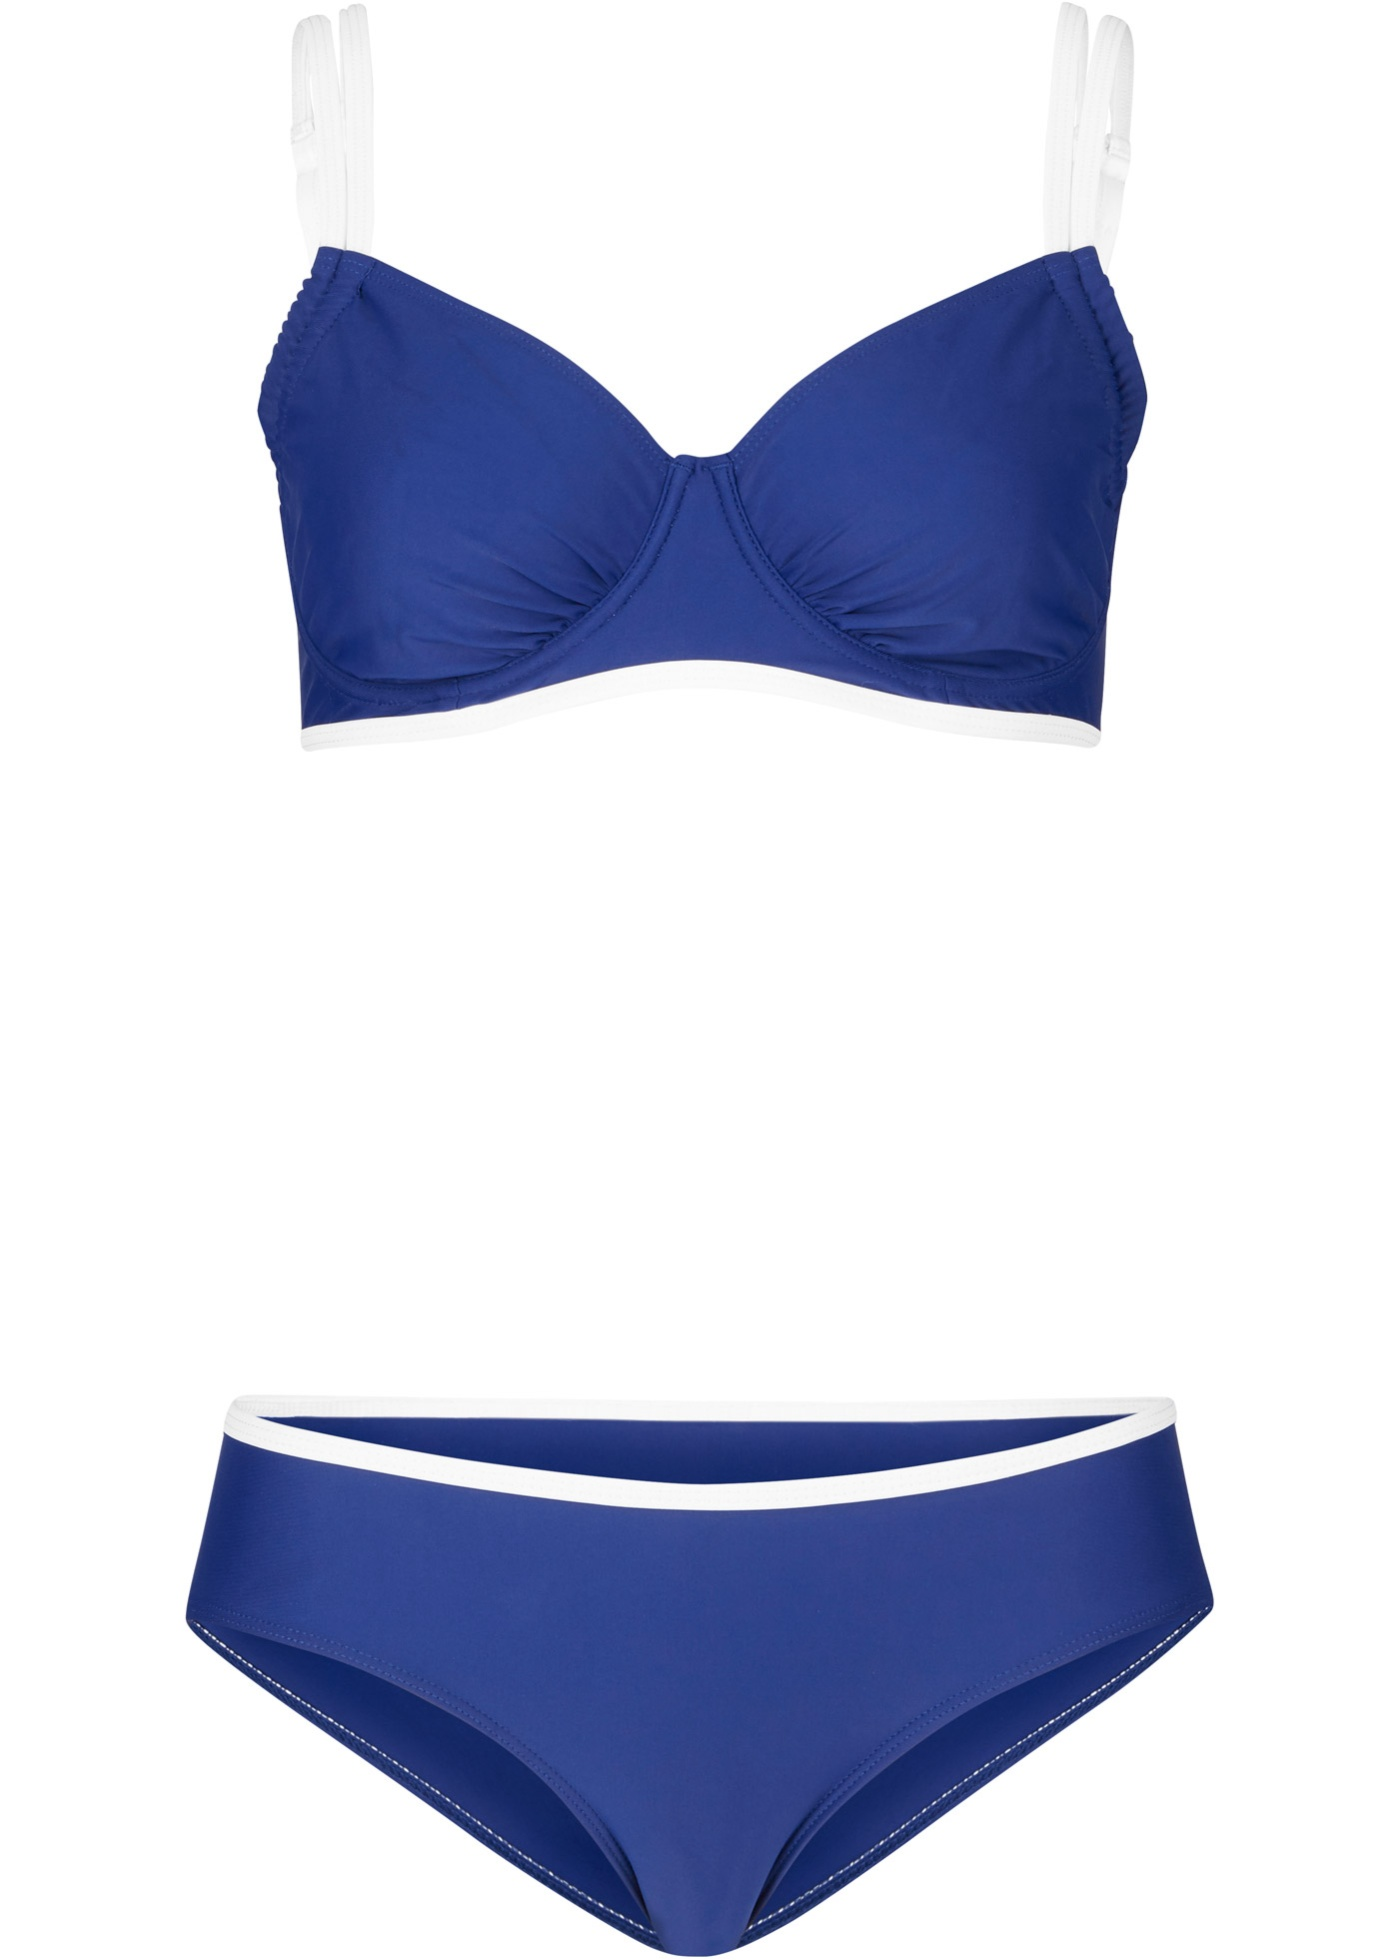 Minimizer Bügel Bikini (2-tlg. Set) in blau für Damen von bonprix